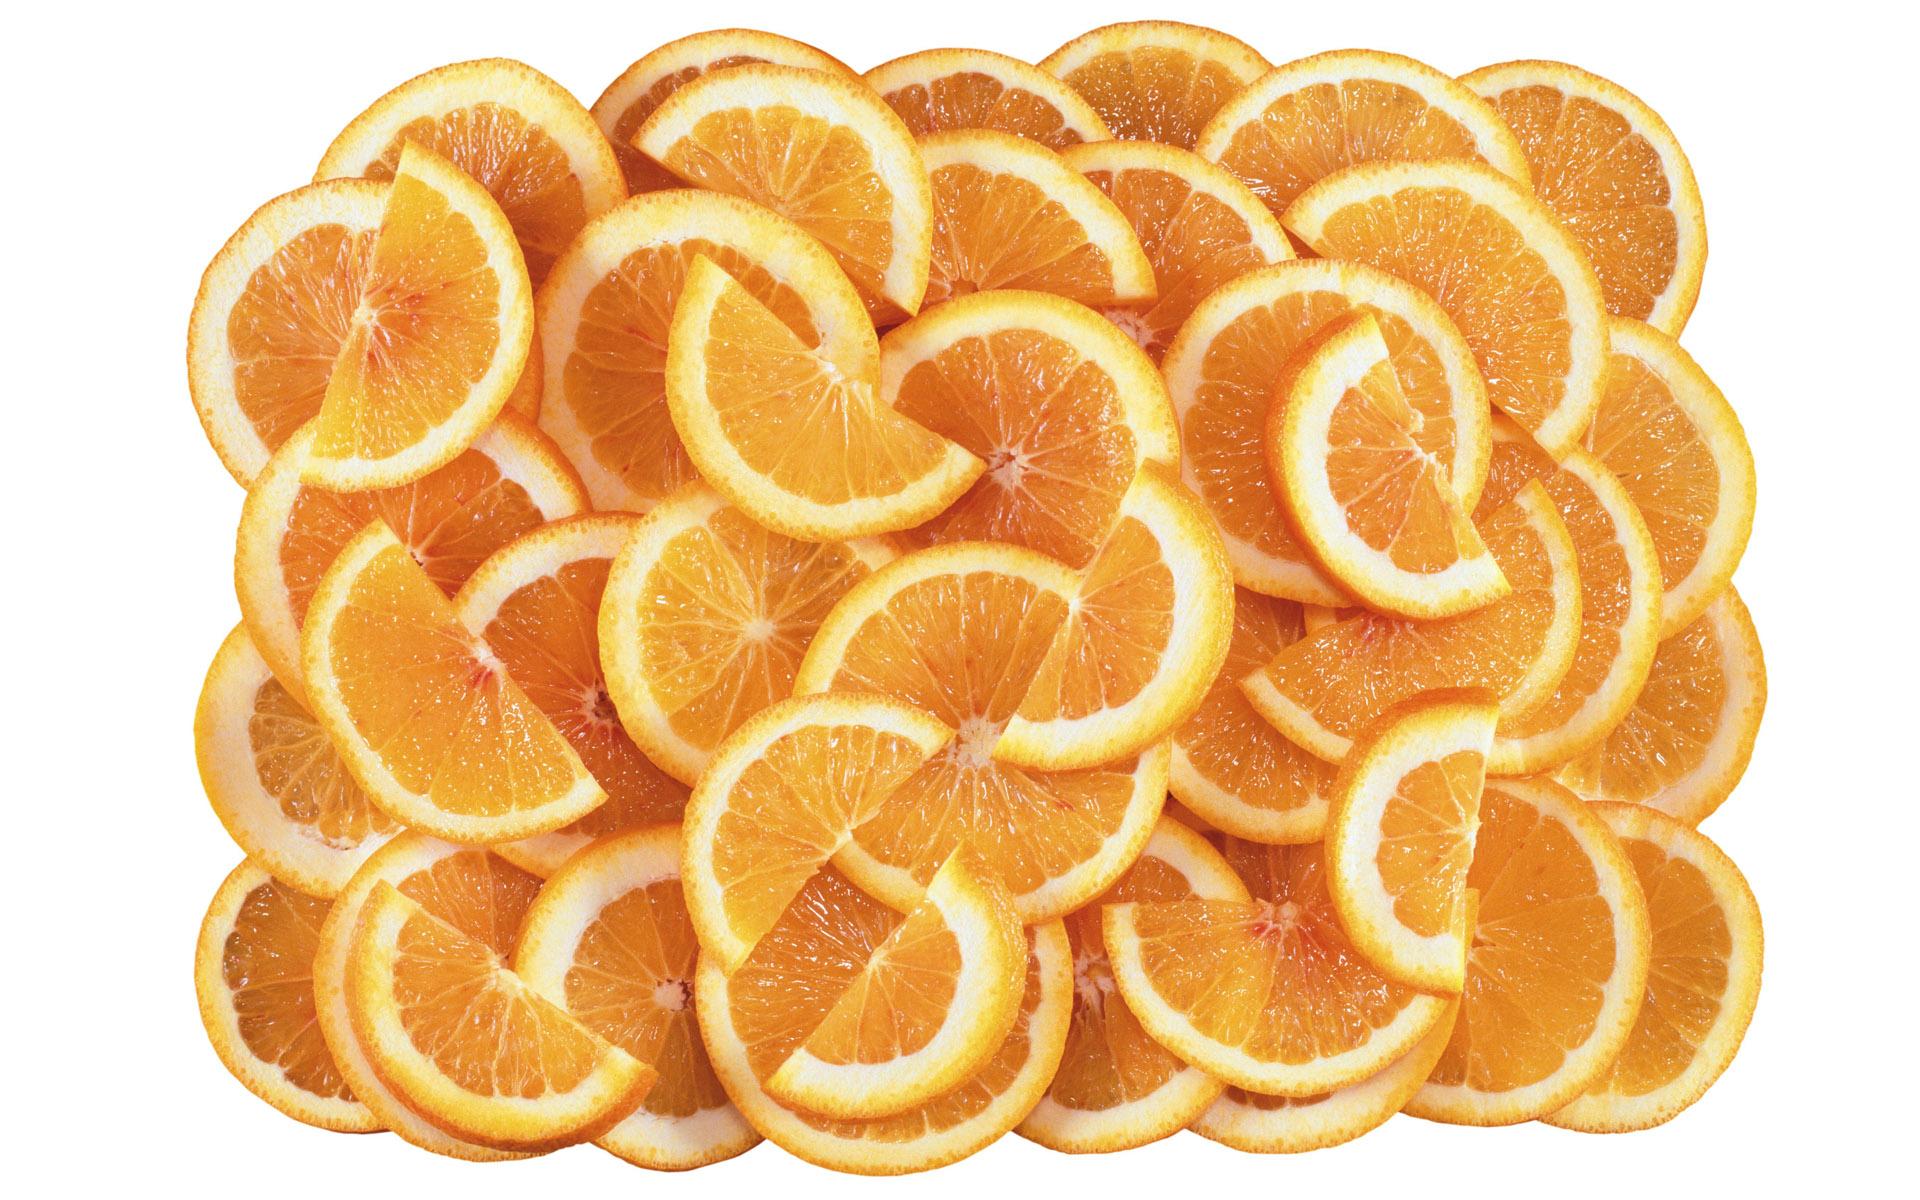 Fruits: Oranges and mandarins Фрукты.  Апельсины и мандарины.